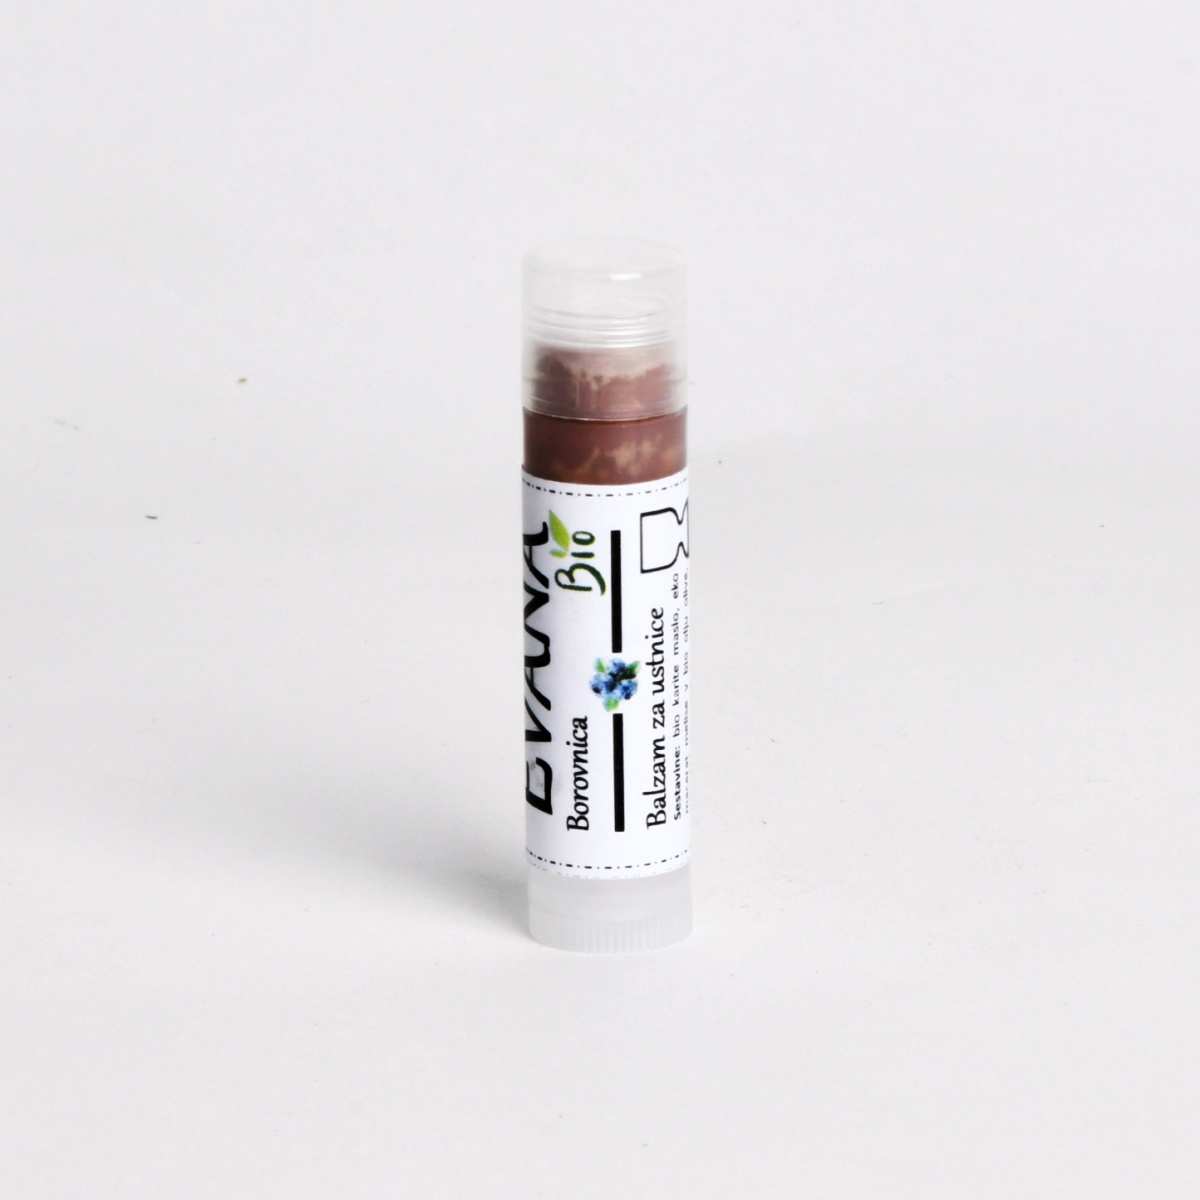 BIO balzam za ustnice 03 02 01 005